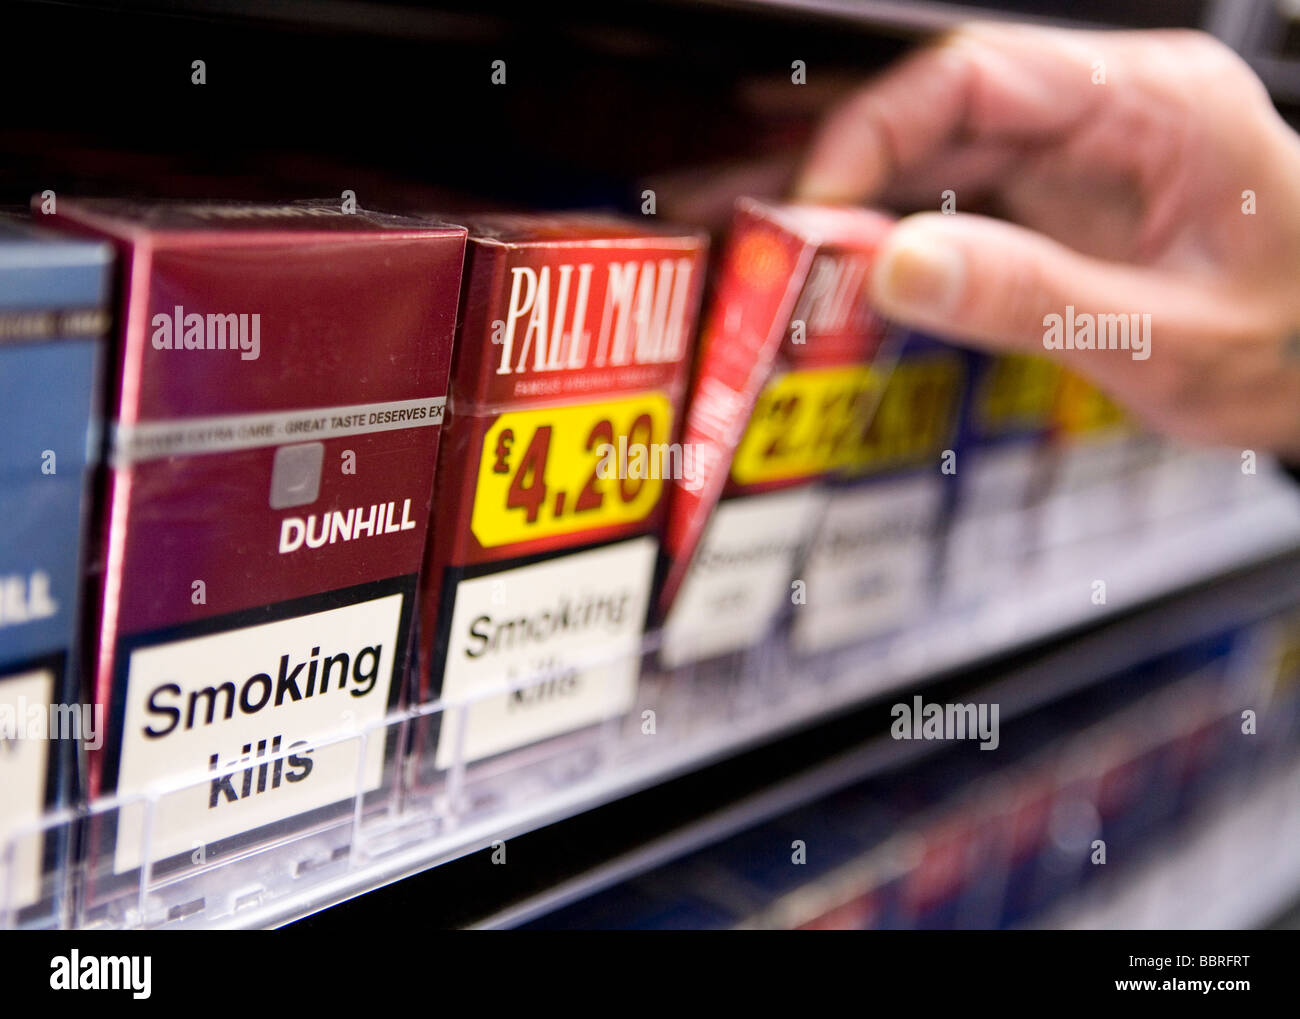 Buy premier cigarettes Salem tobacco